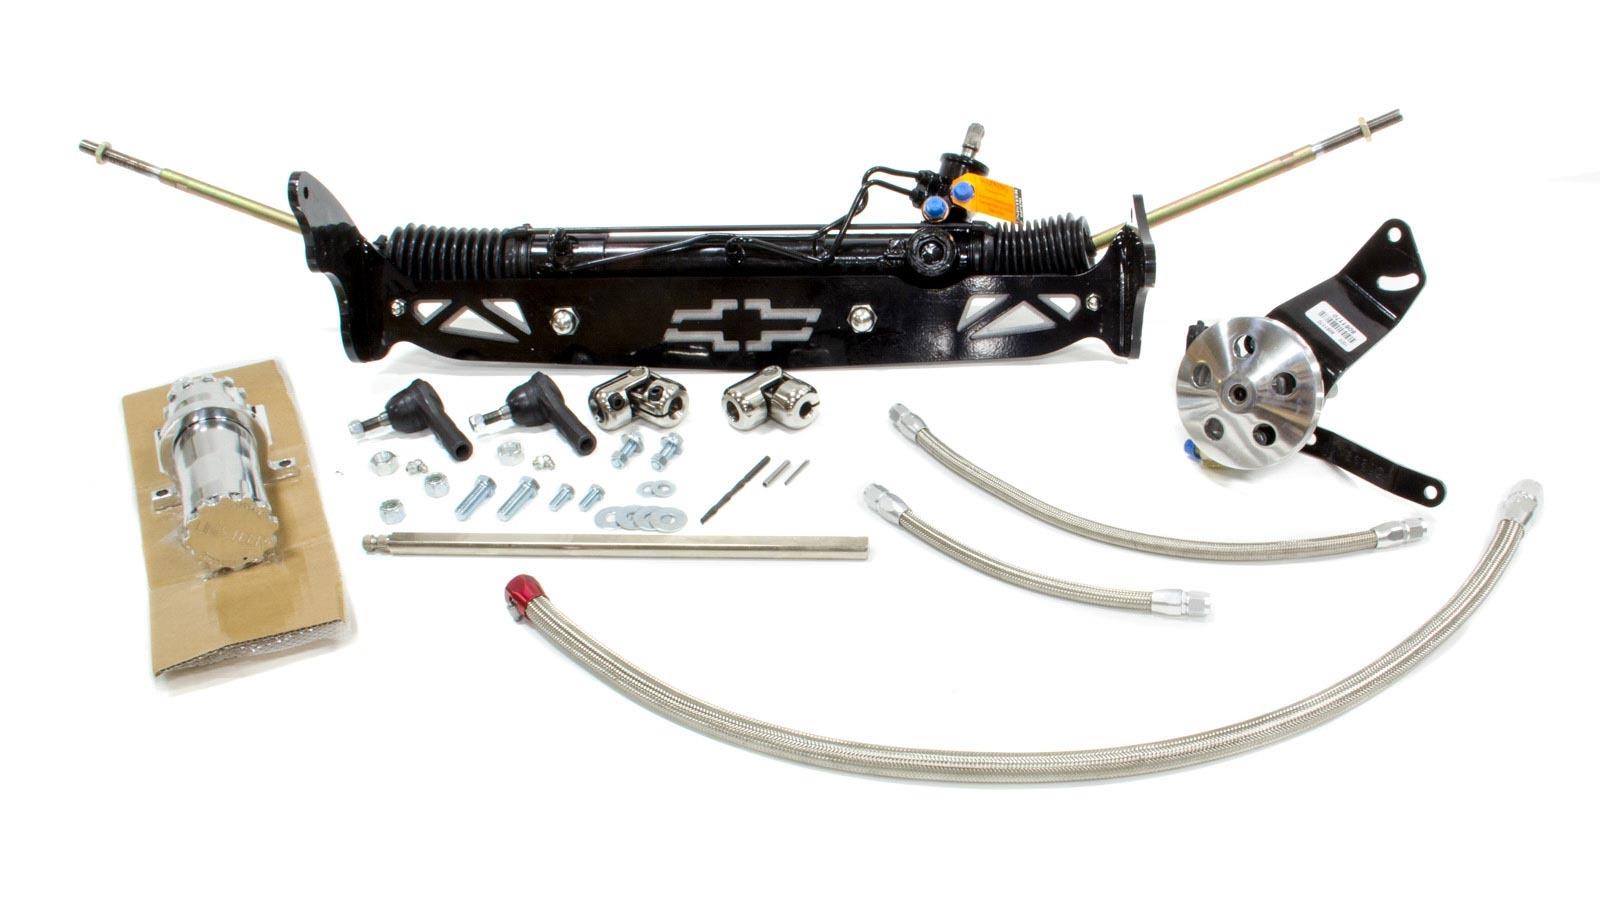 Unisteer Performance Products 8011740-01 Rack and Pinion, Power, Aluminum, Black Powder Coat, Drum Brake Spindles, 2WD, GM Fullsize Truck 1960-66, Kit